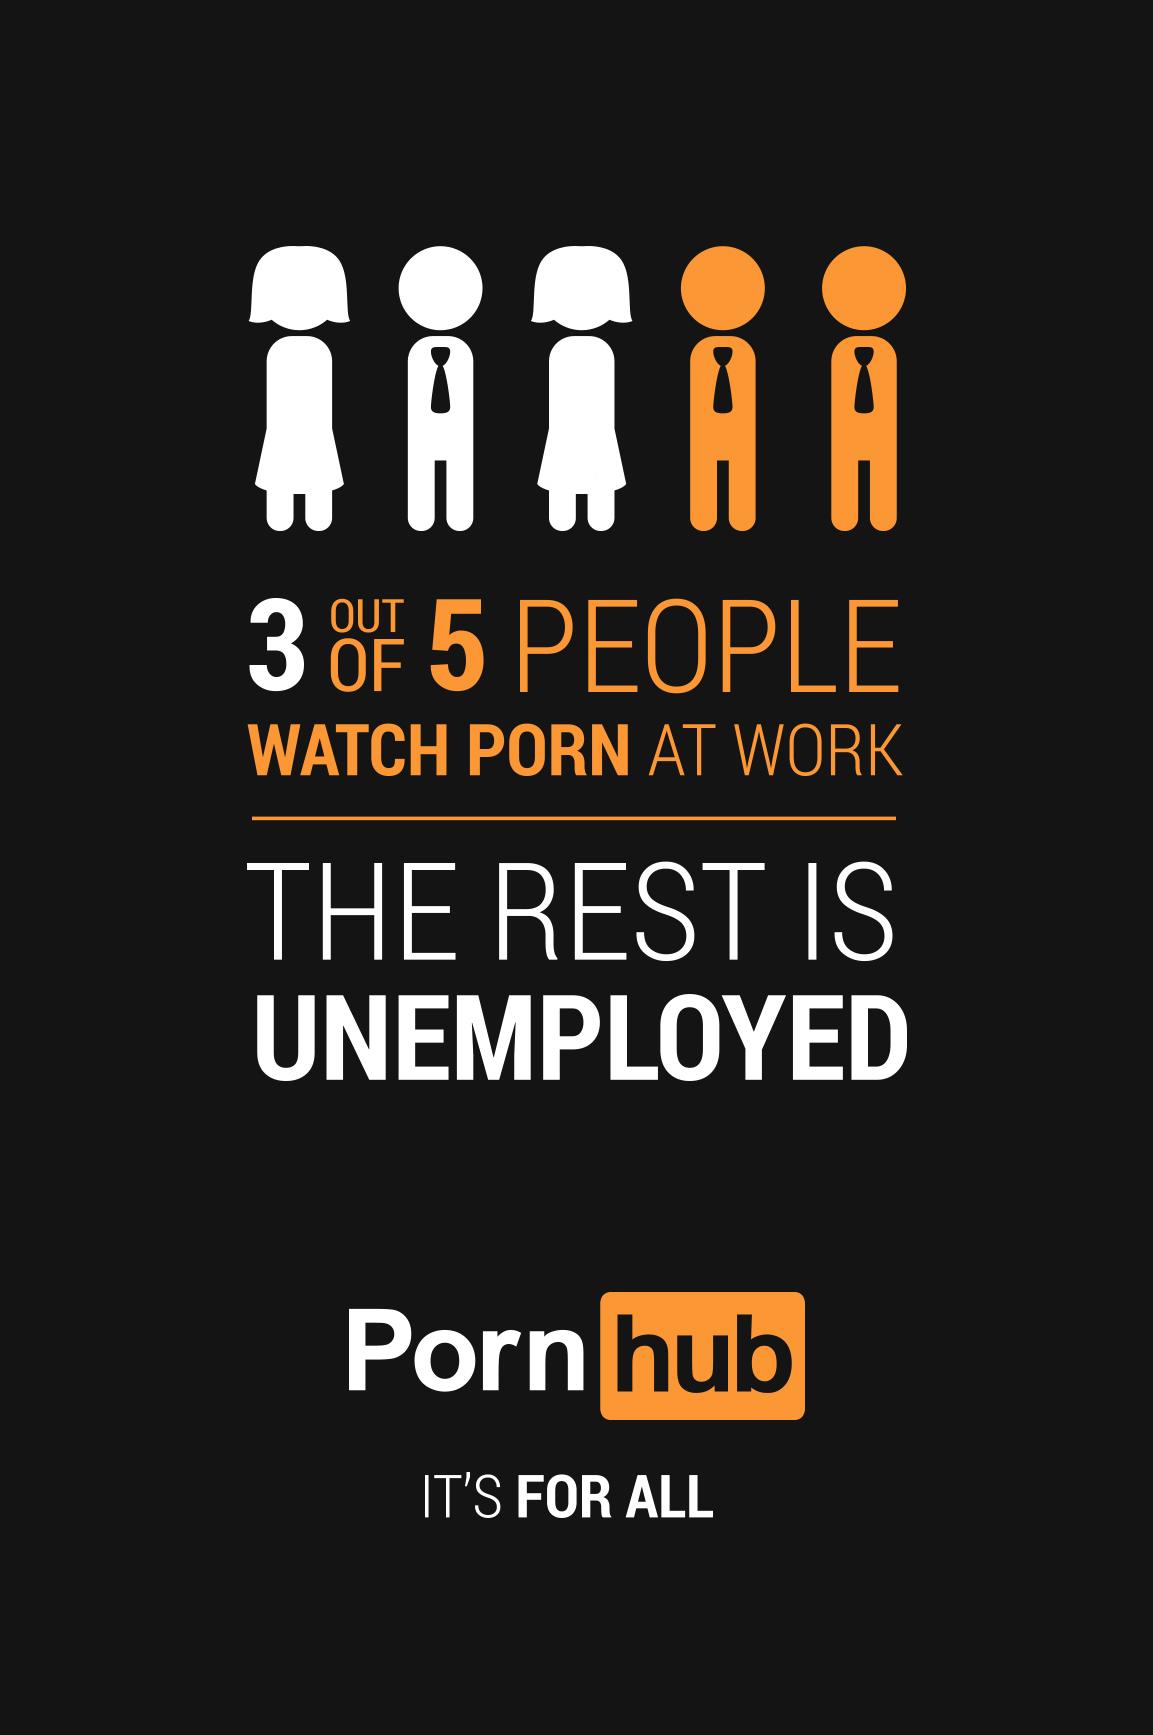 Реклама порно в порнохаб фото 606-953